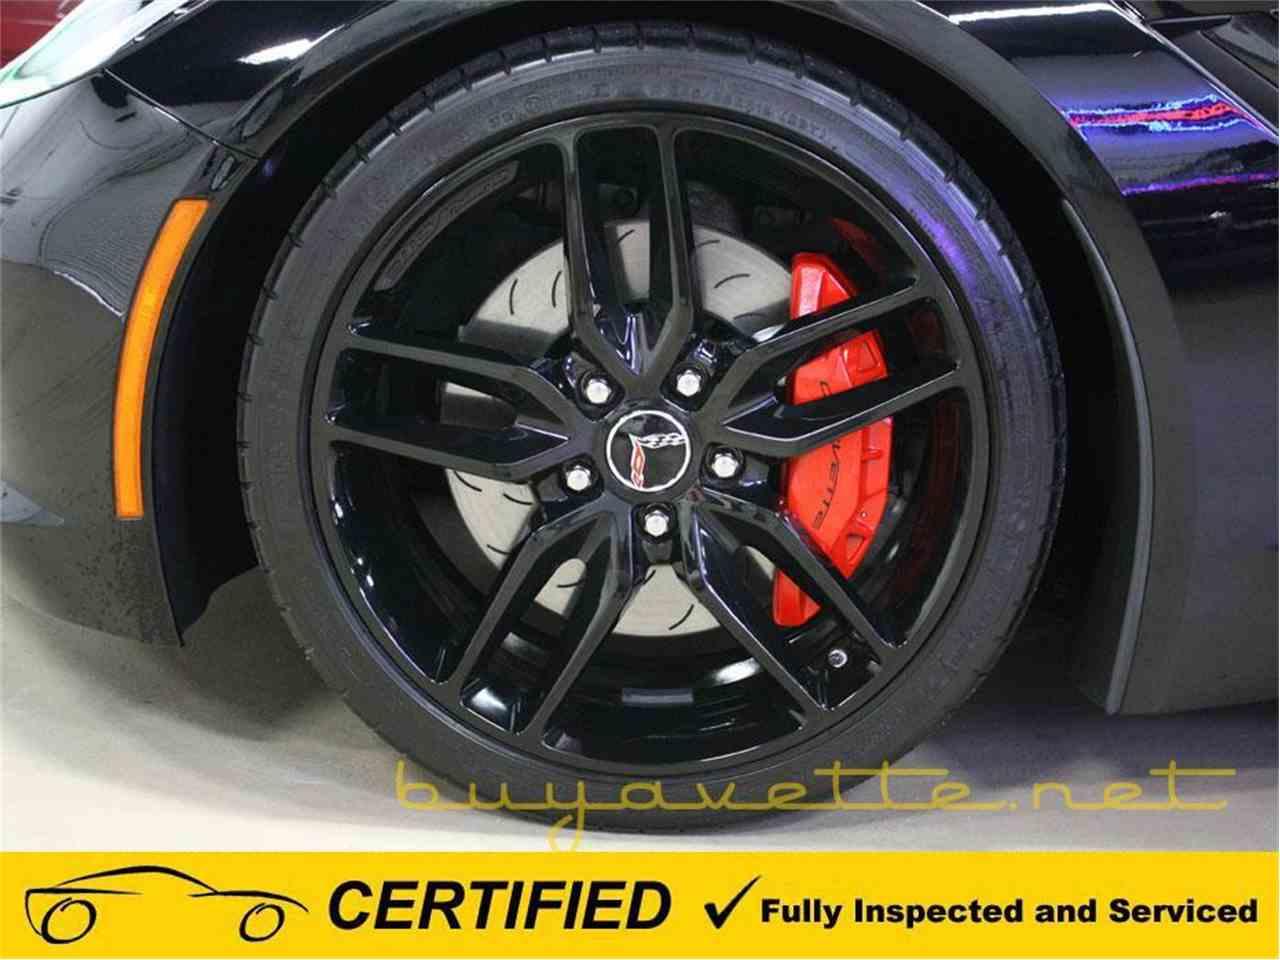 Large Picture of 2014 Chevrolet Corvette located in Atlanta Georgia - $48,999.00 - M6GR